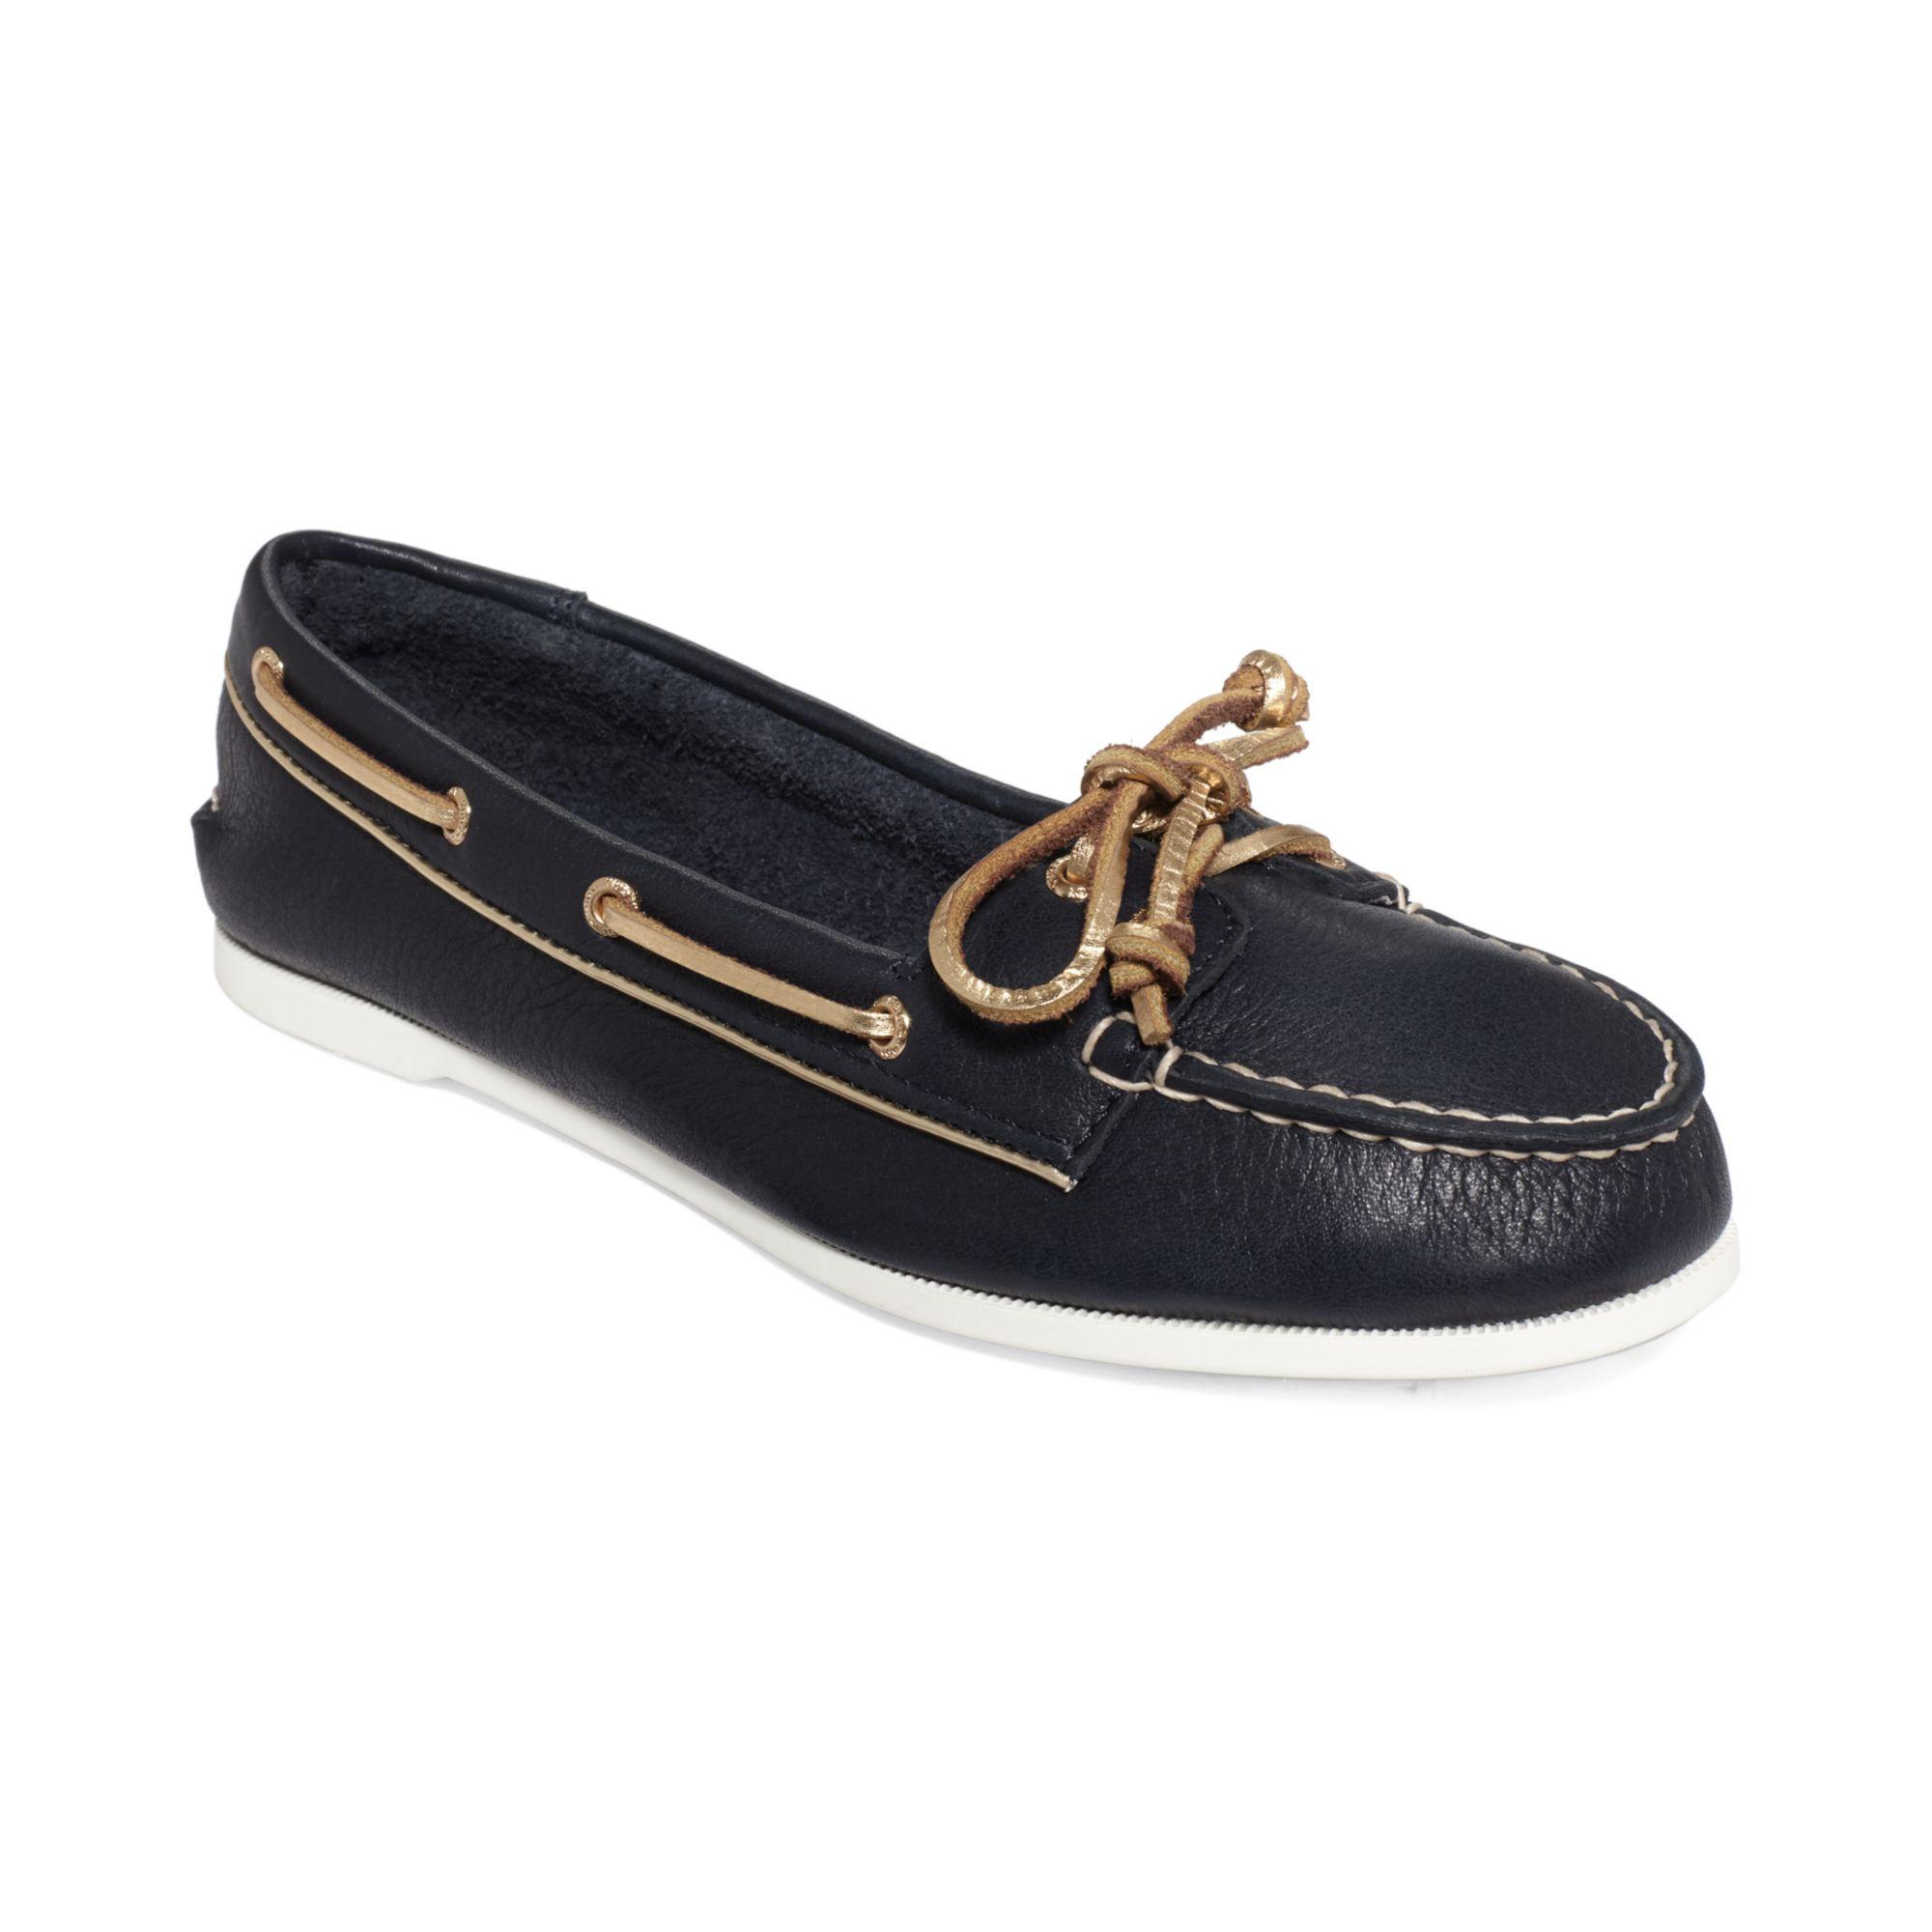 Asos Ladies Boat Shoes